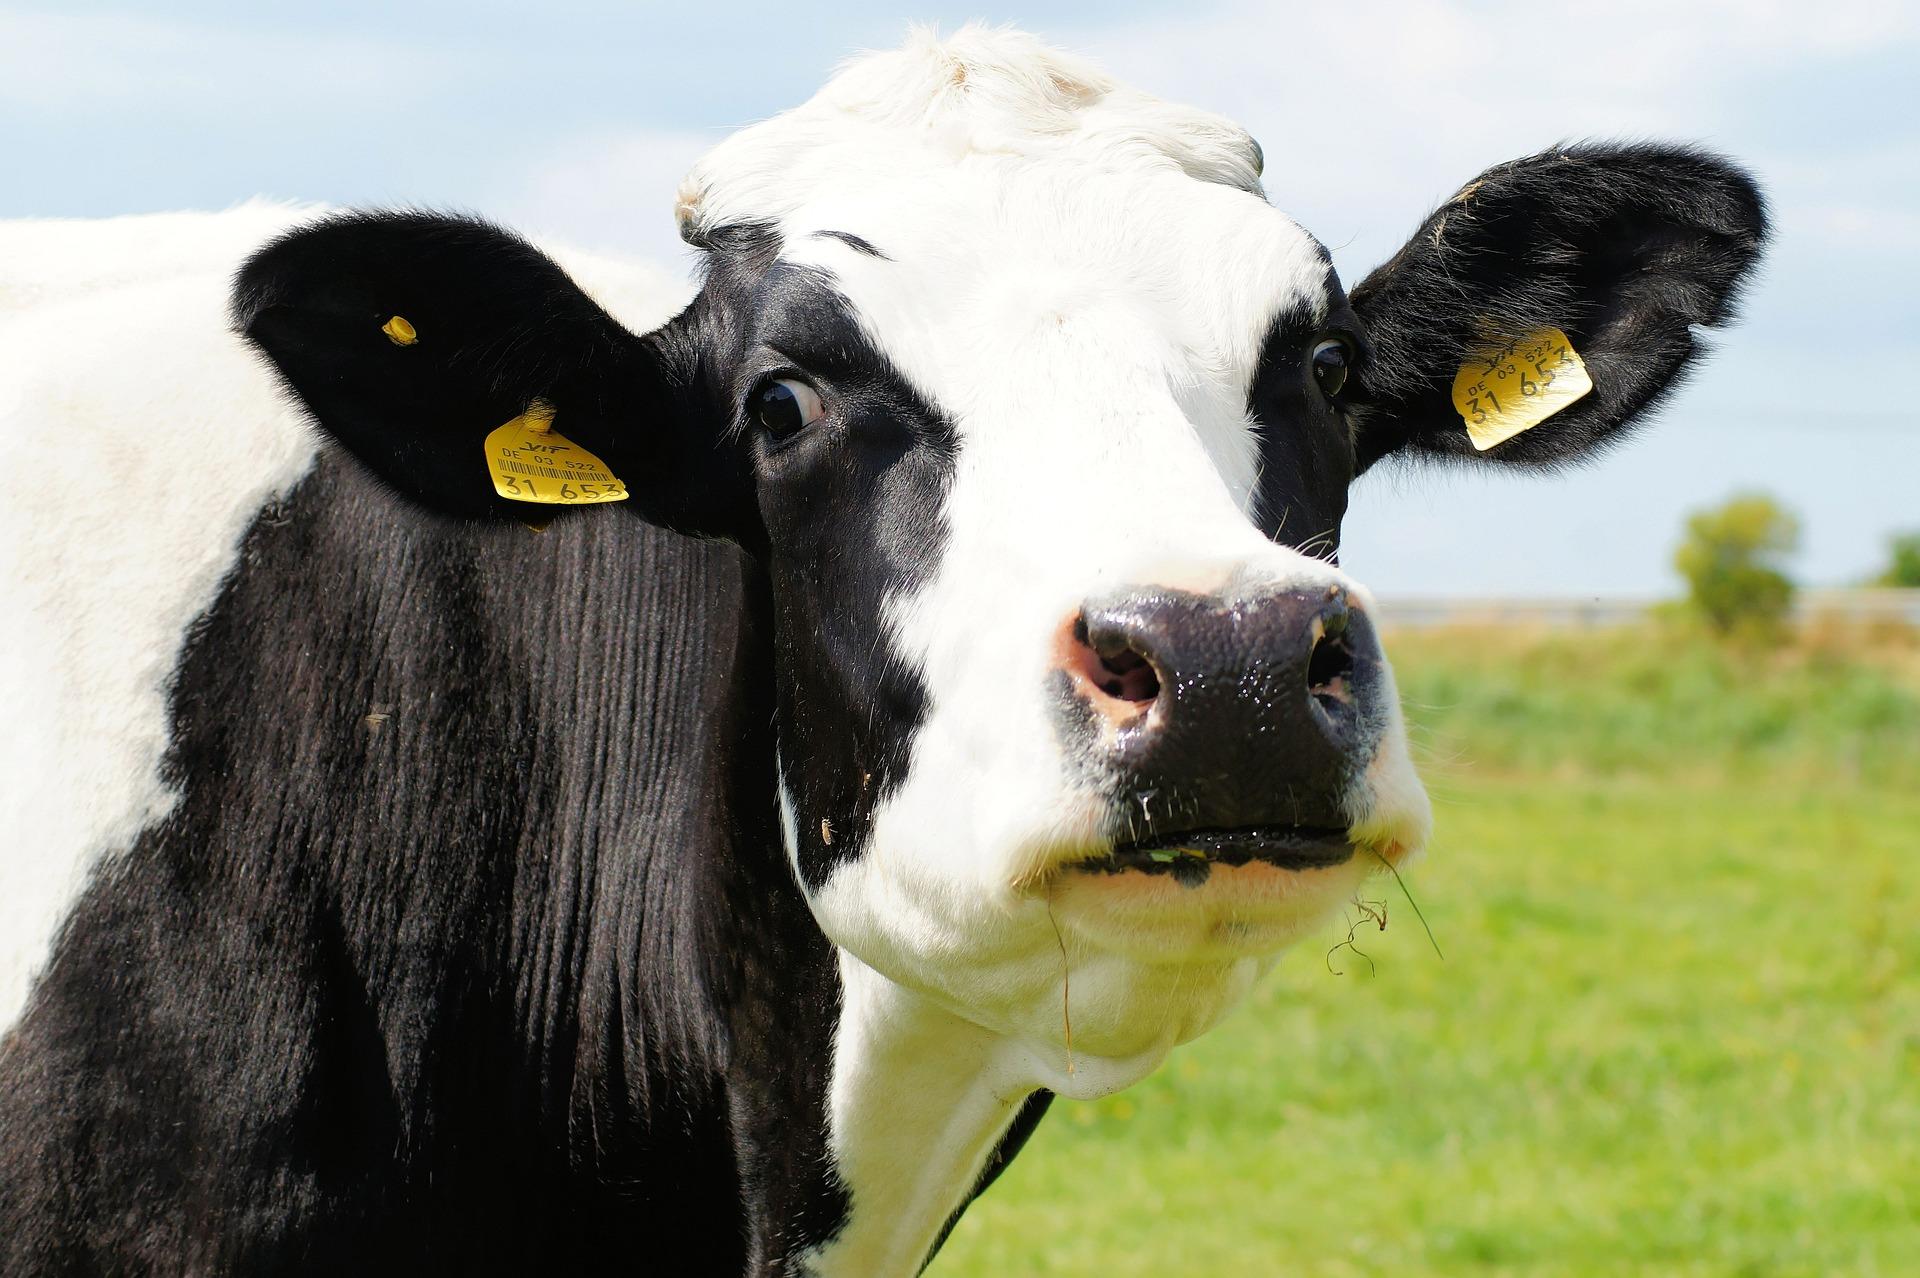 cow-394148_1920